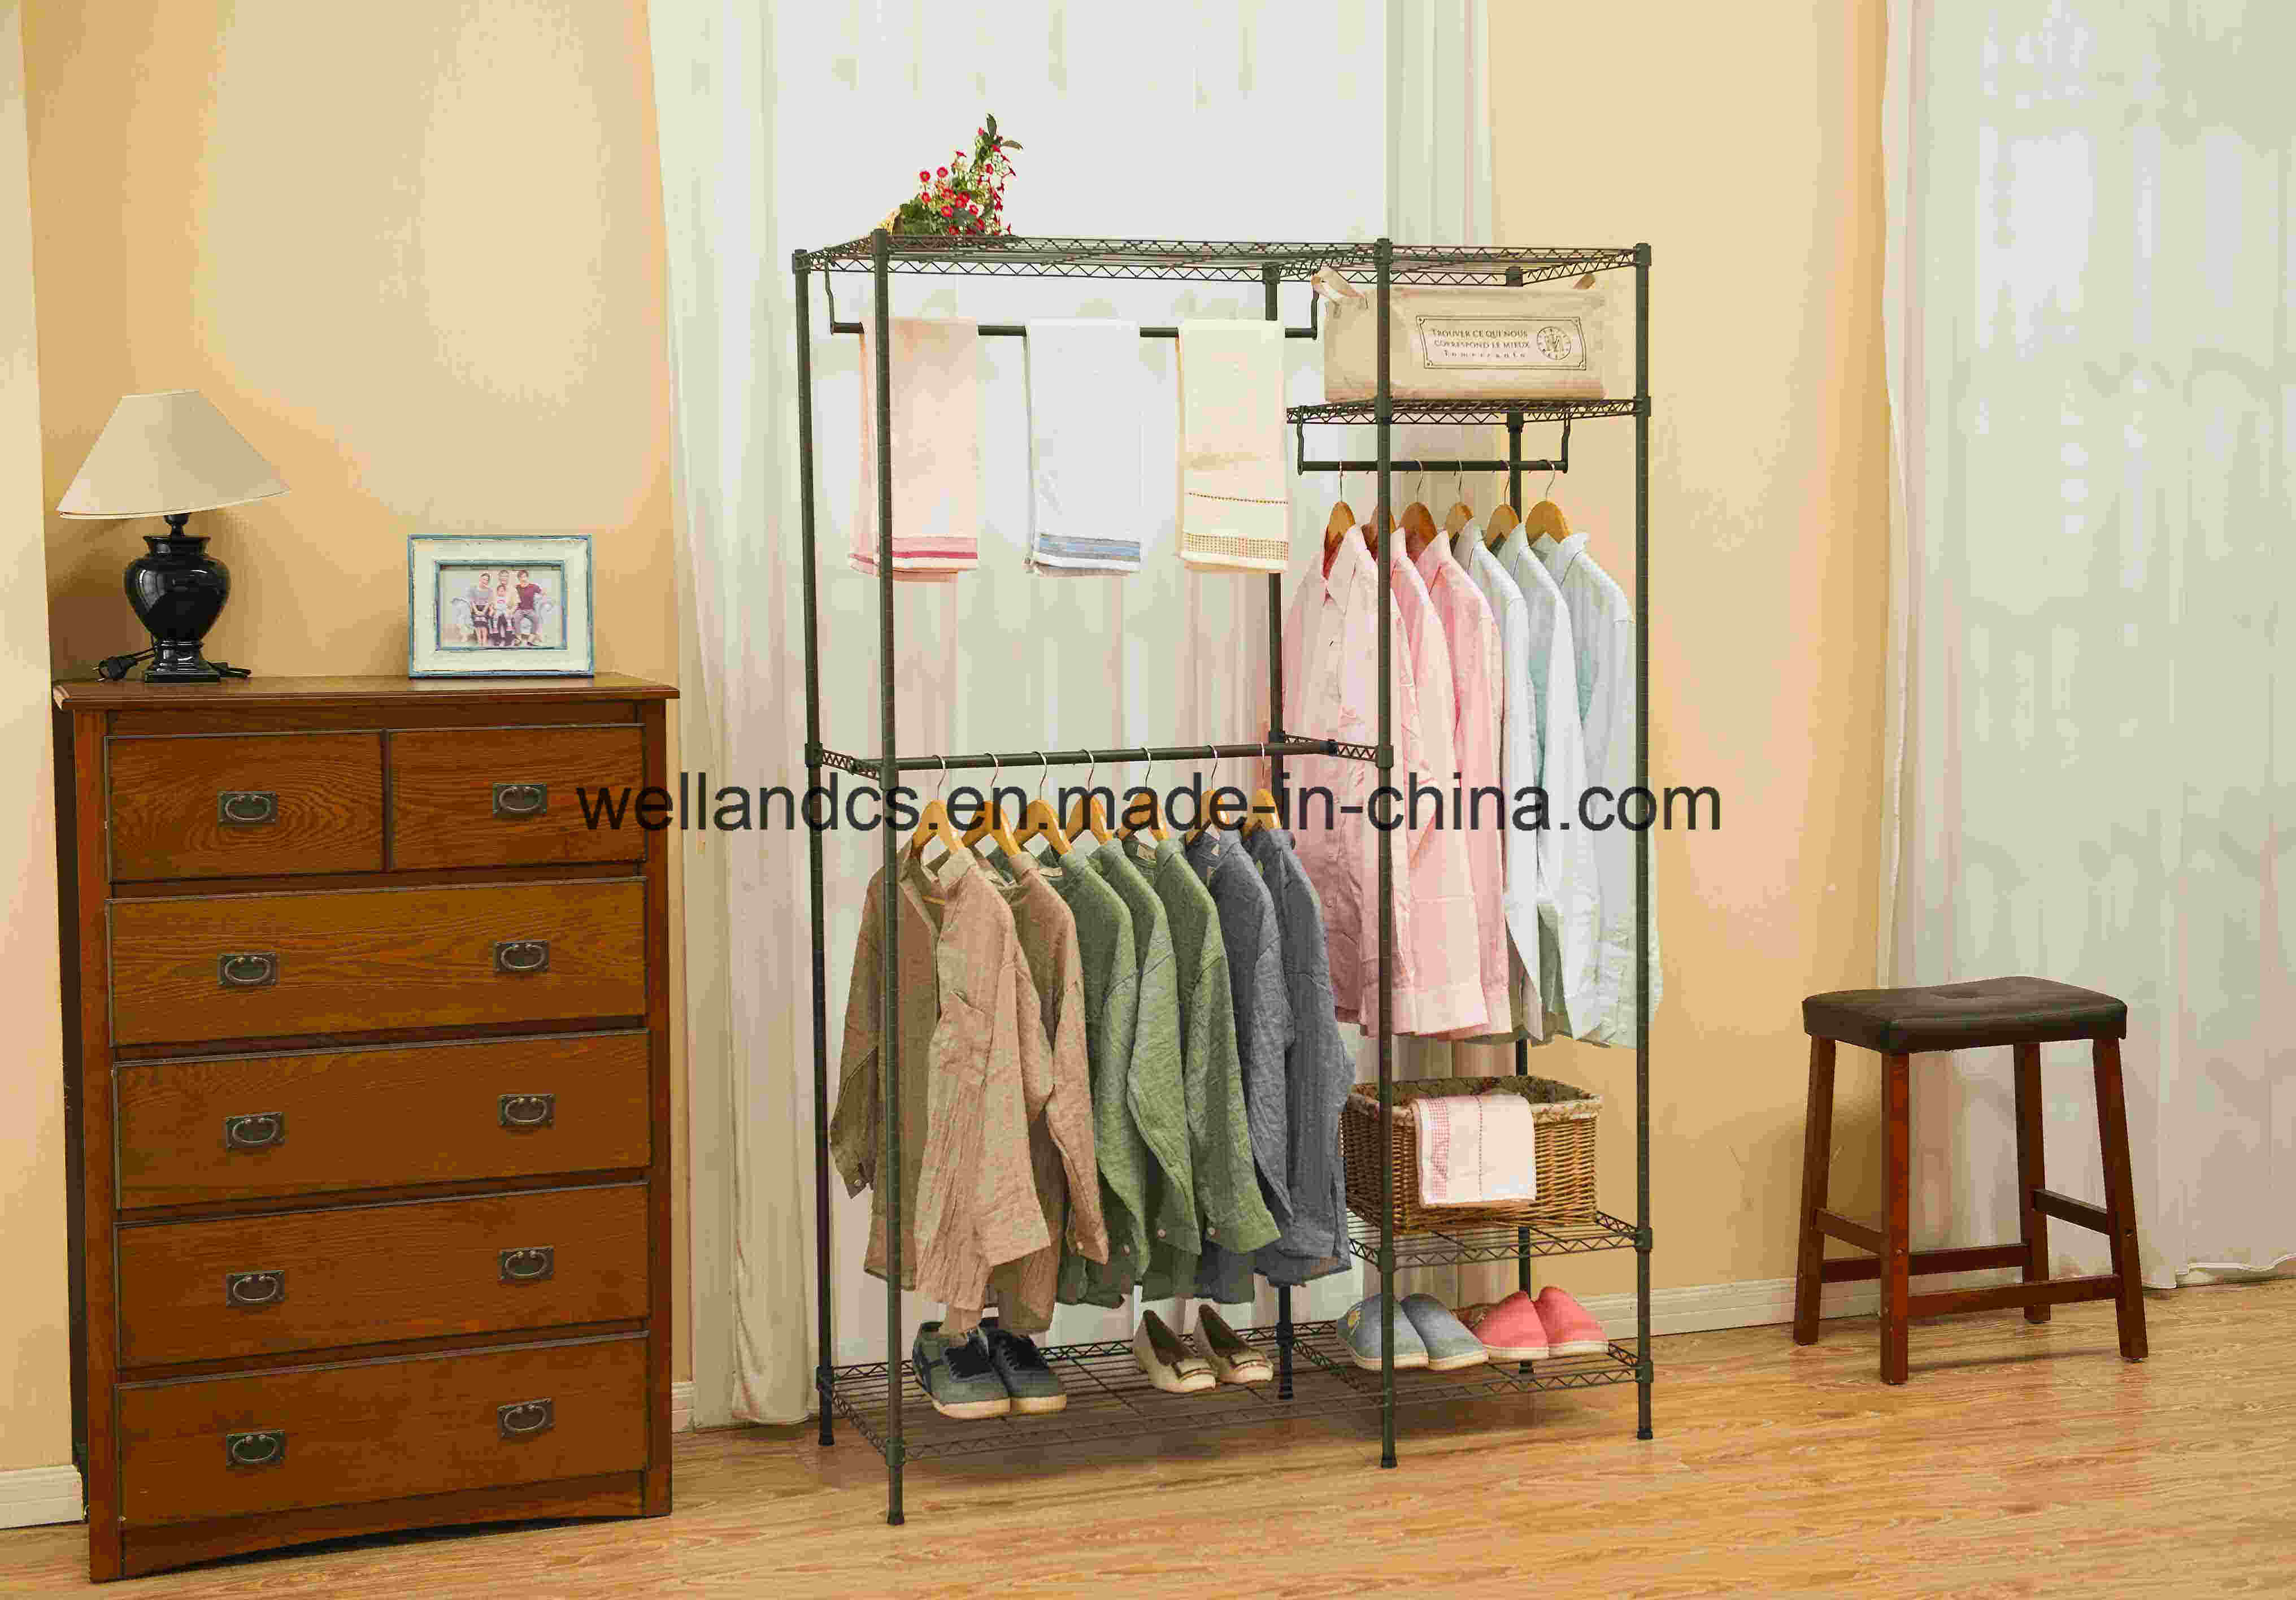 rolling ca pdp storage organization wayfair shoe clothes pair reviews basics metal rack